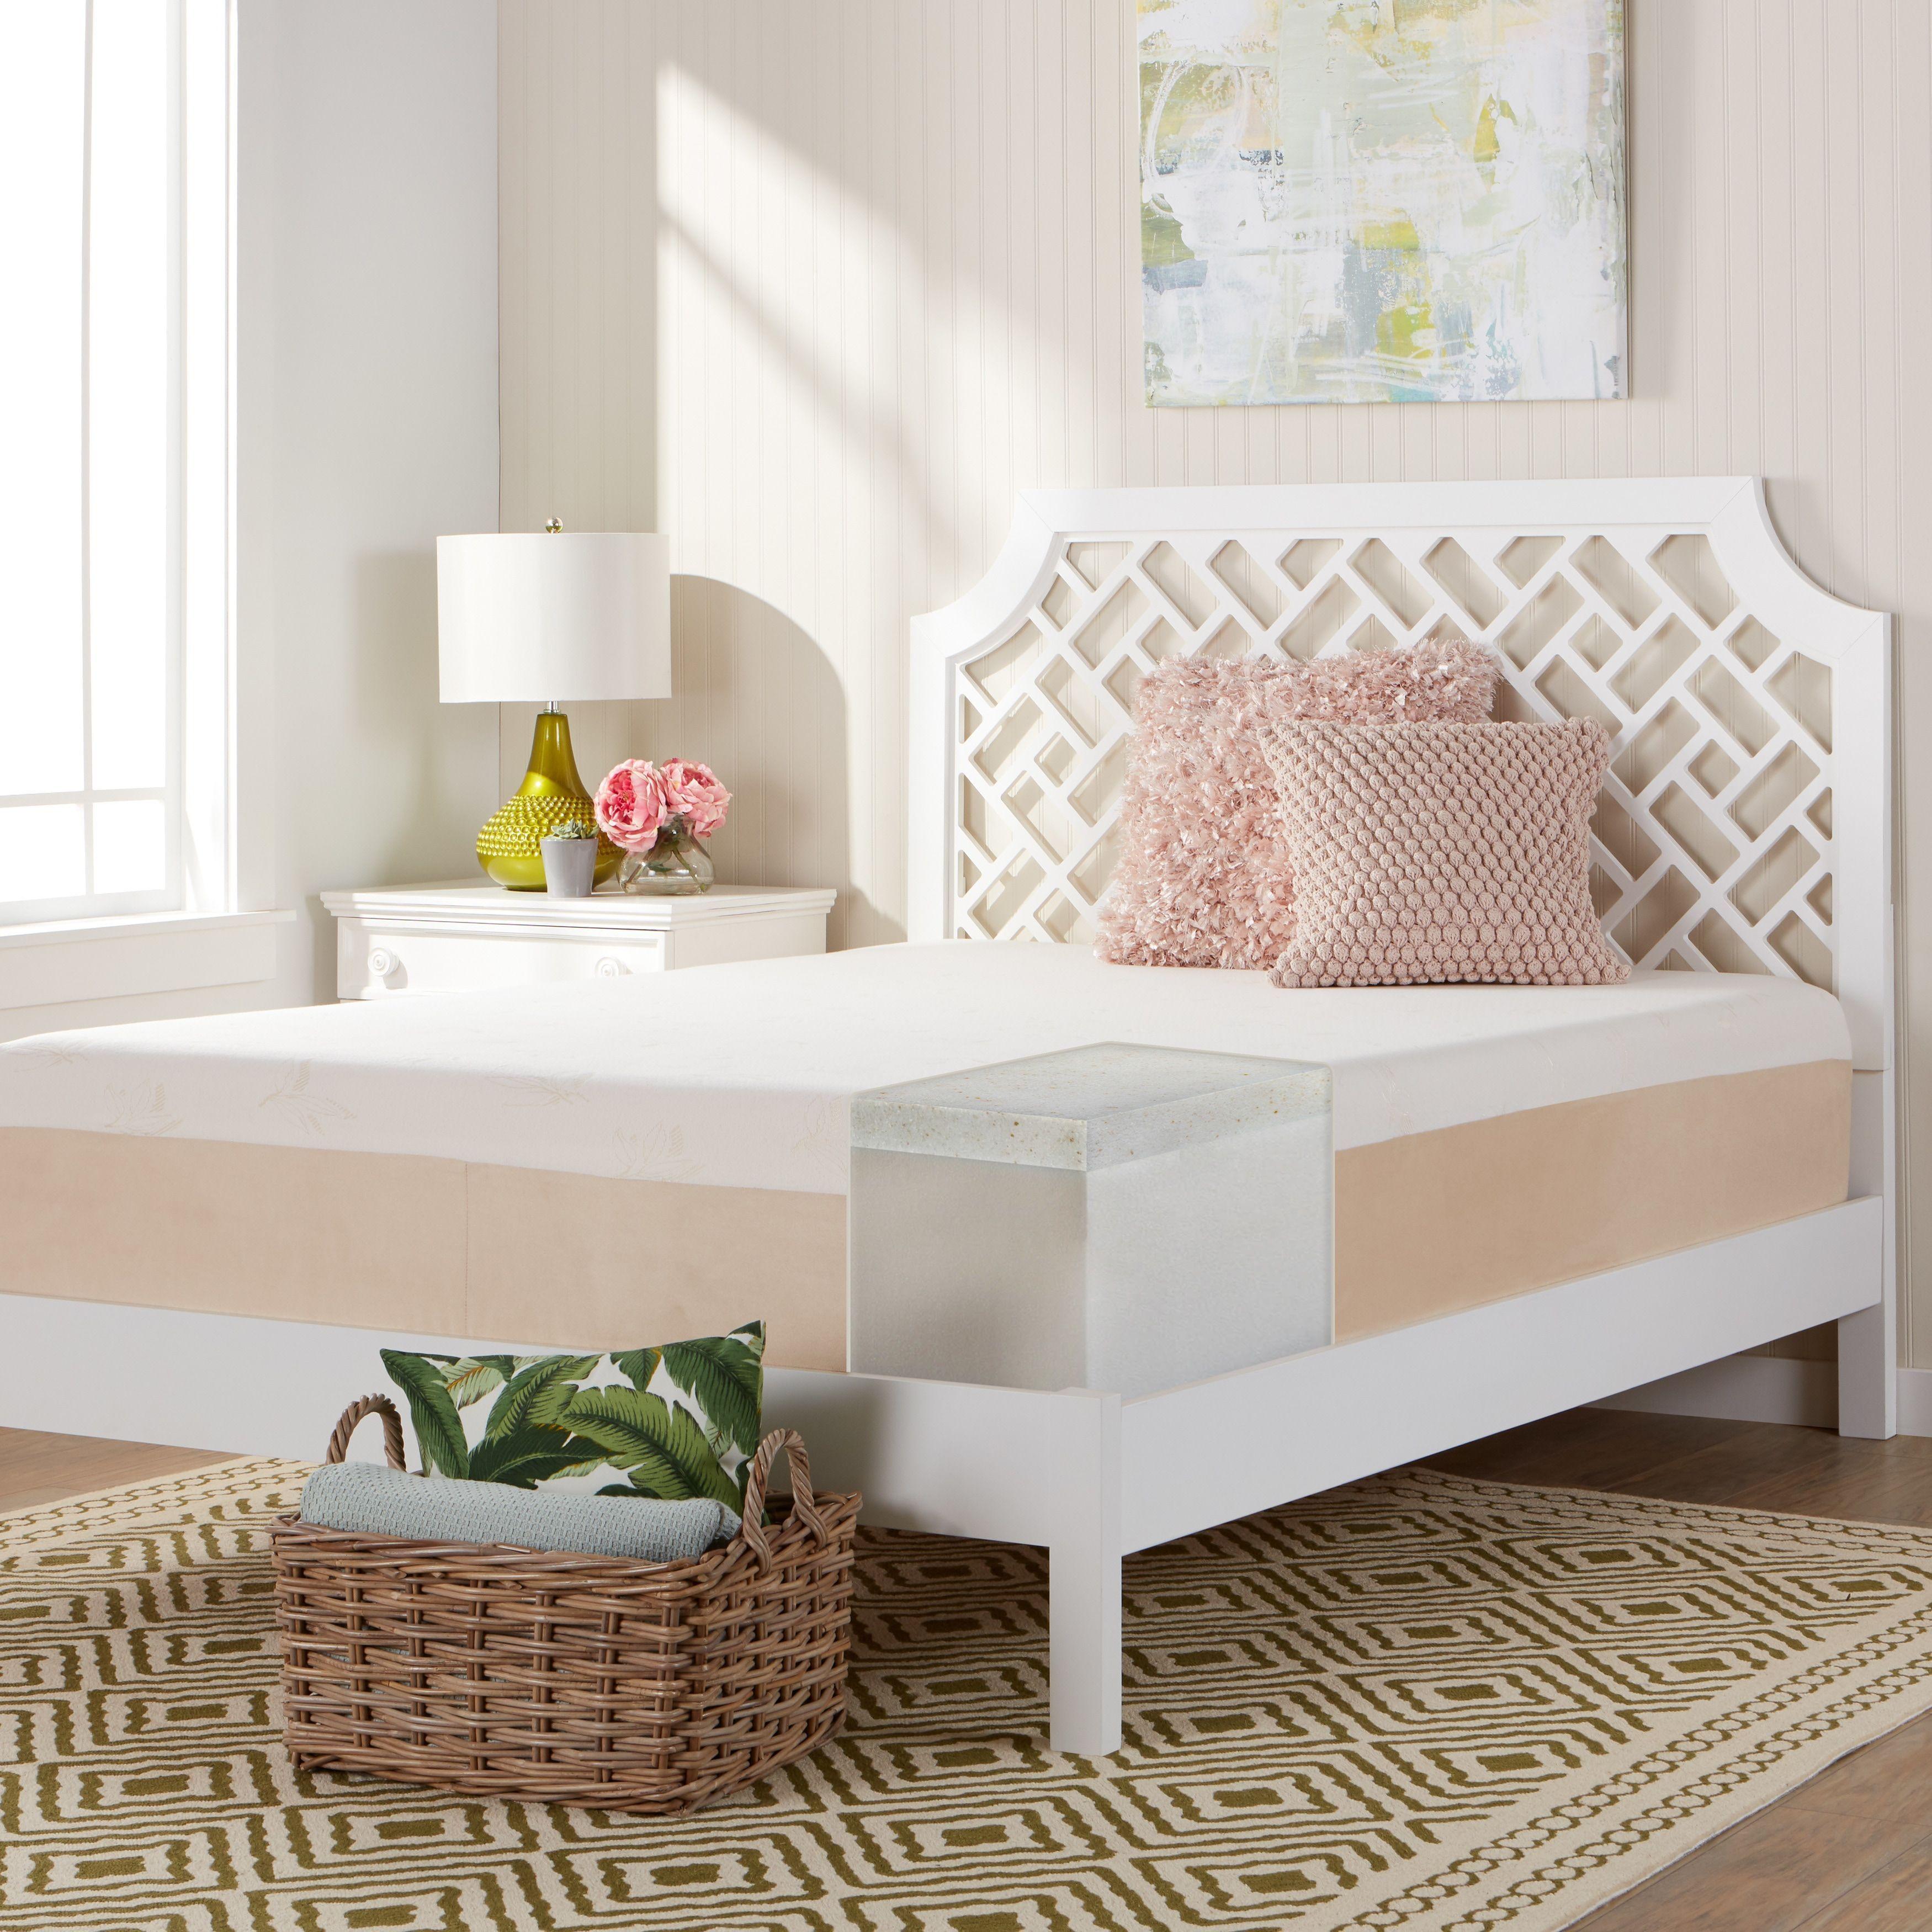 comfort dreams select a firmness 14 inch twin xl size copper brown